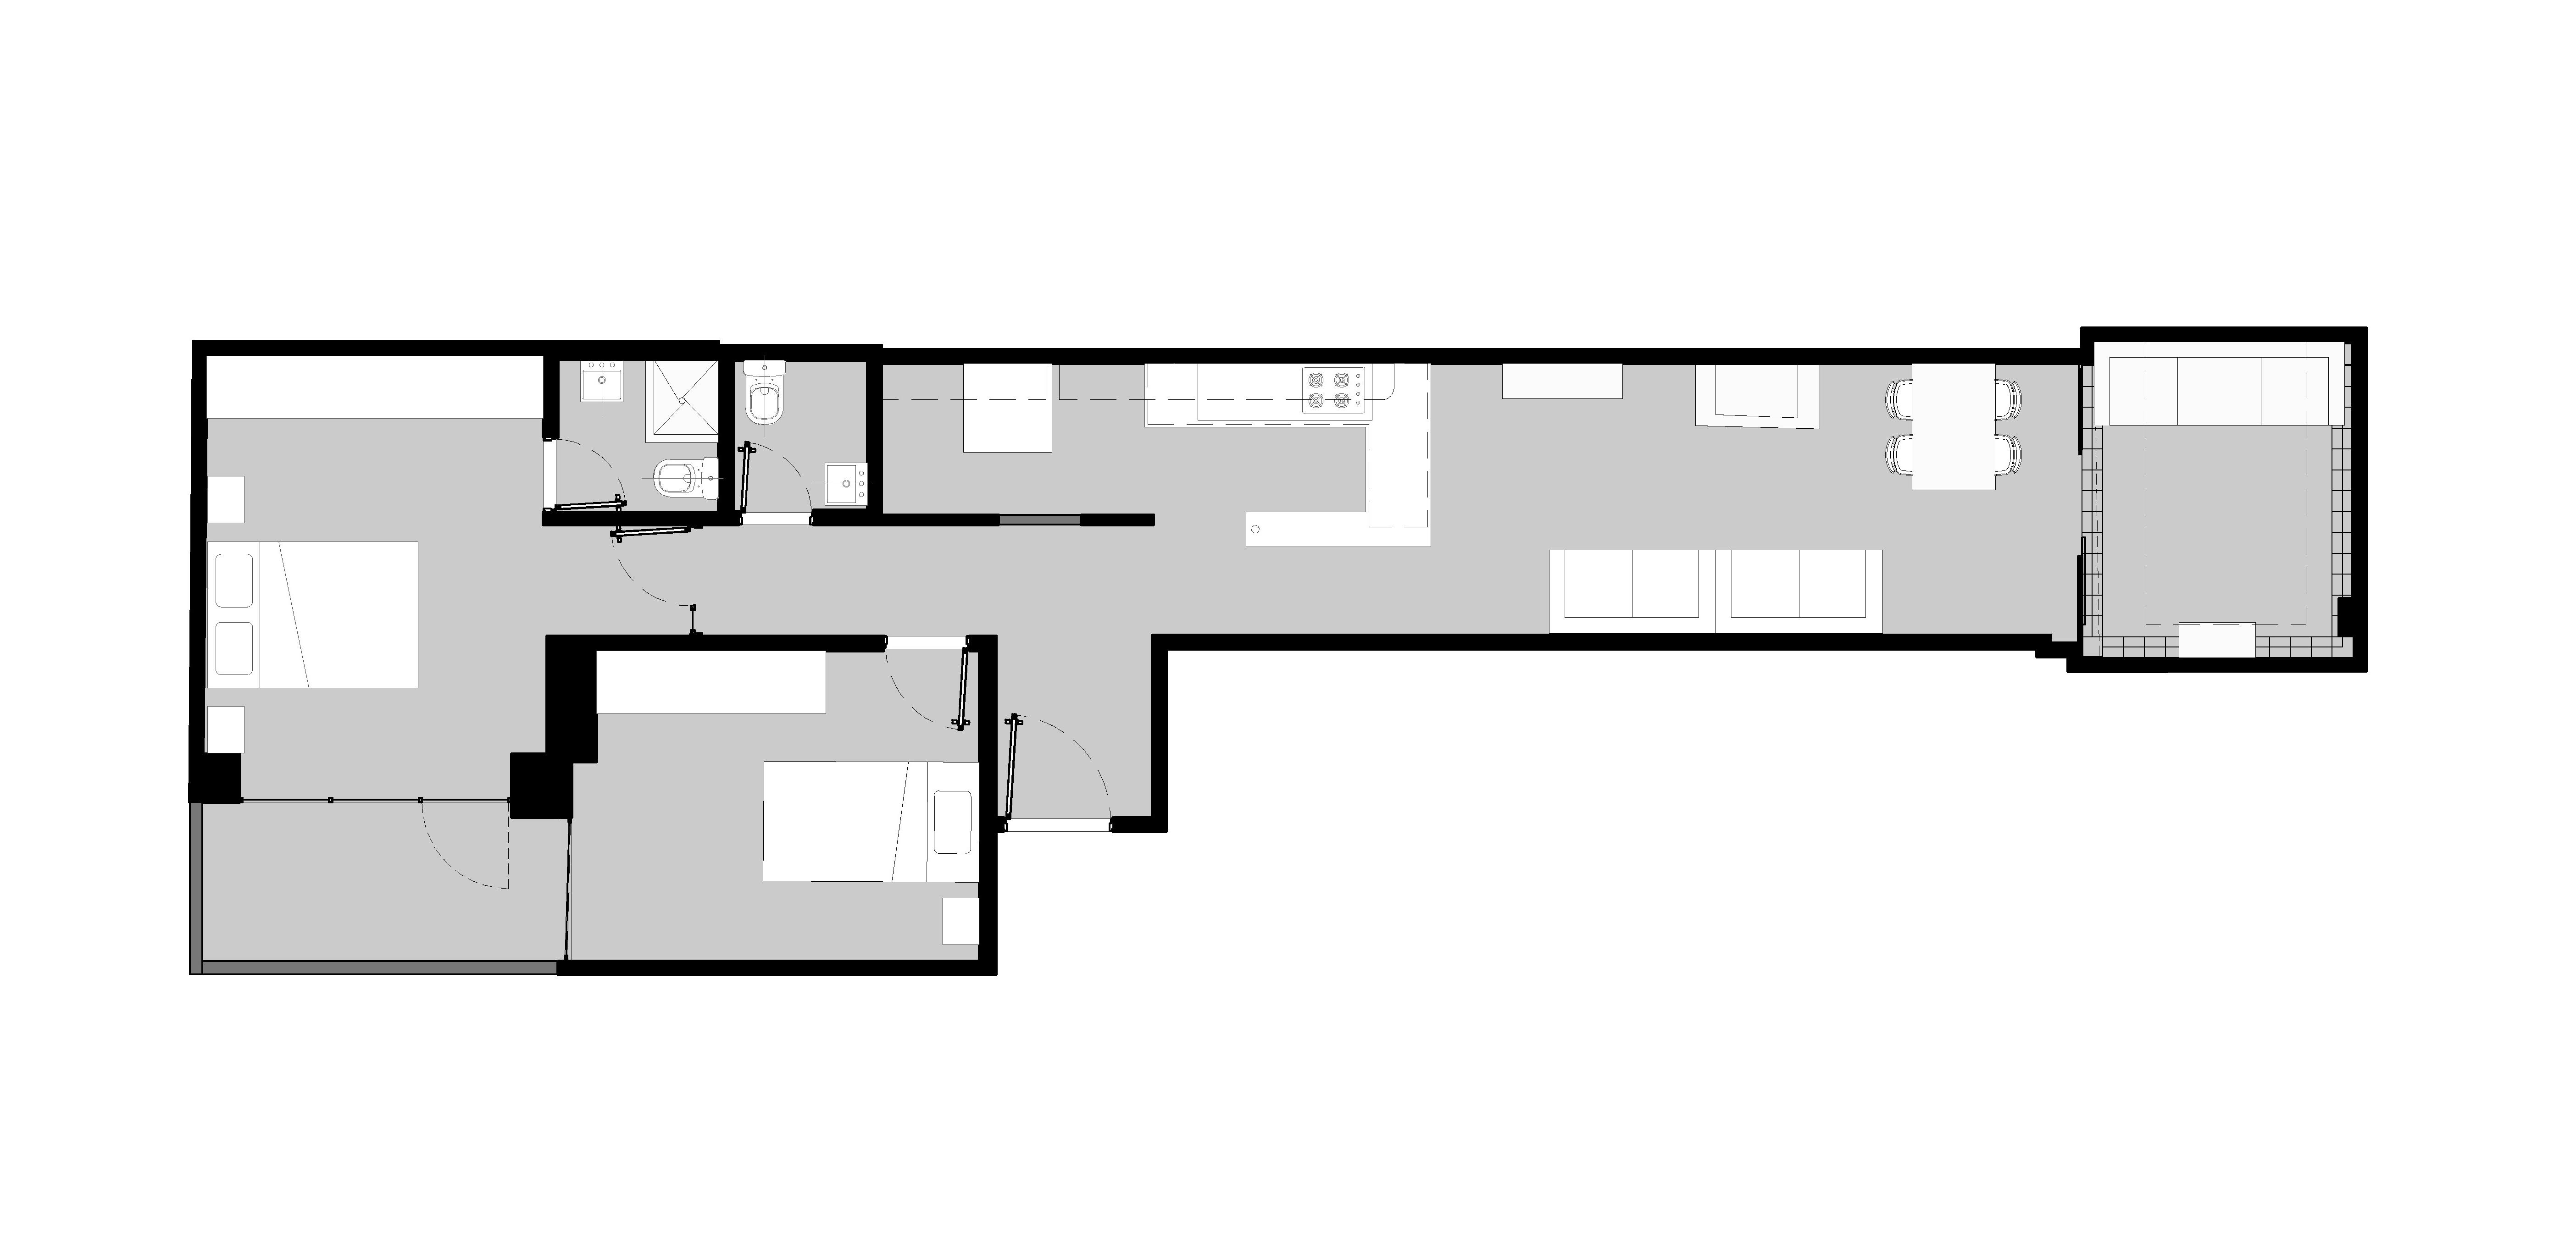 ensamble de arquitectura integral remode